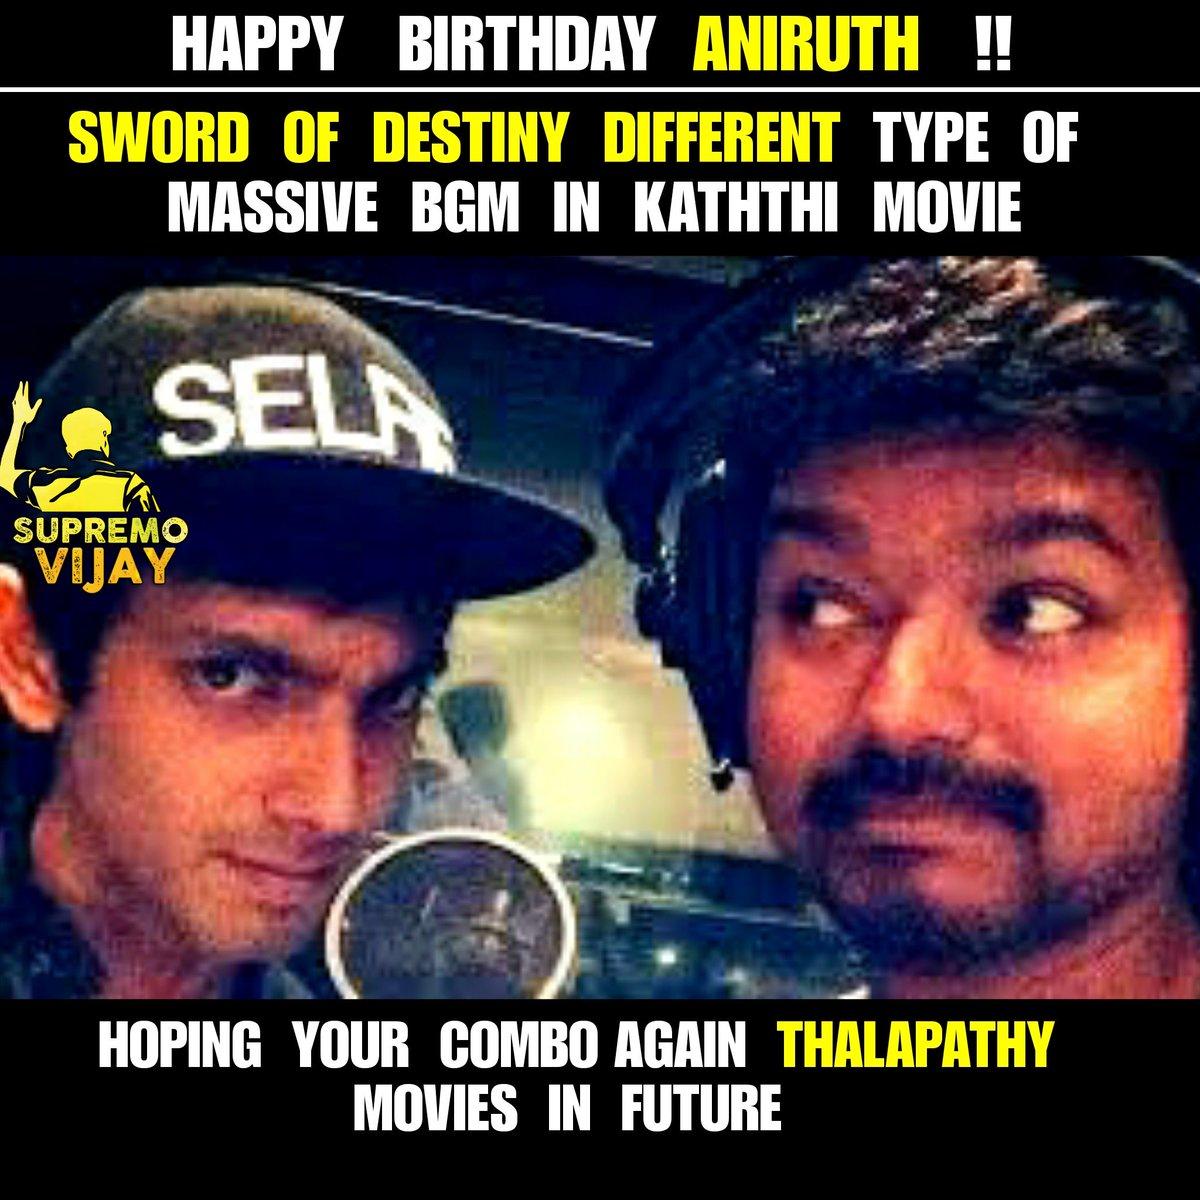 Karnataka Vijay Fans On Twitter Happy Birthday At Anirudhofficial